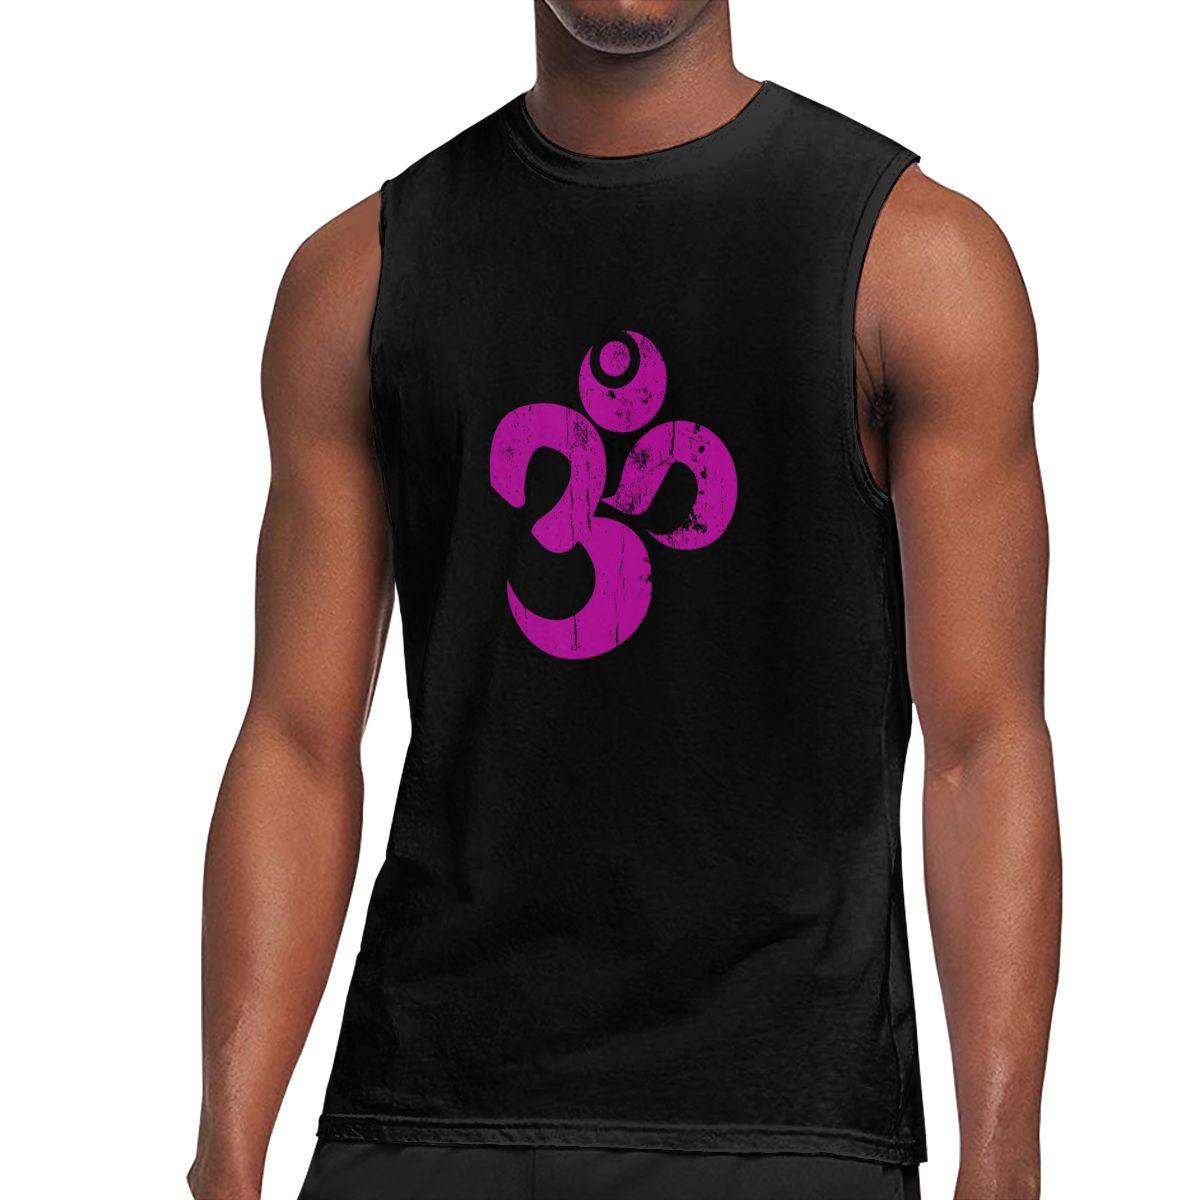 Camiseta sin mangas para hombre clásico, símbolo Om Ohm, hindú